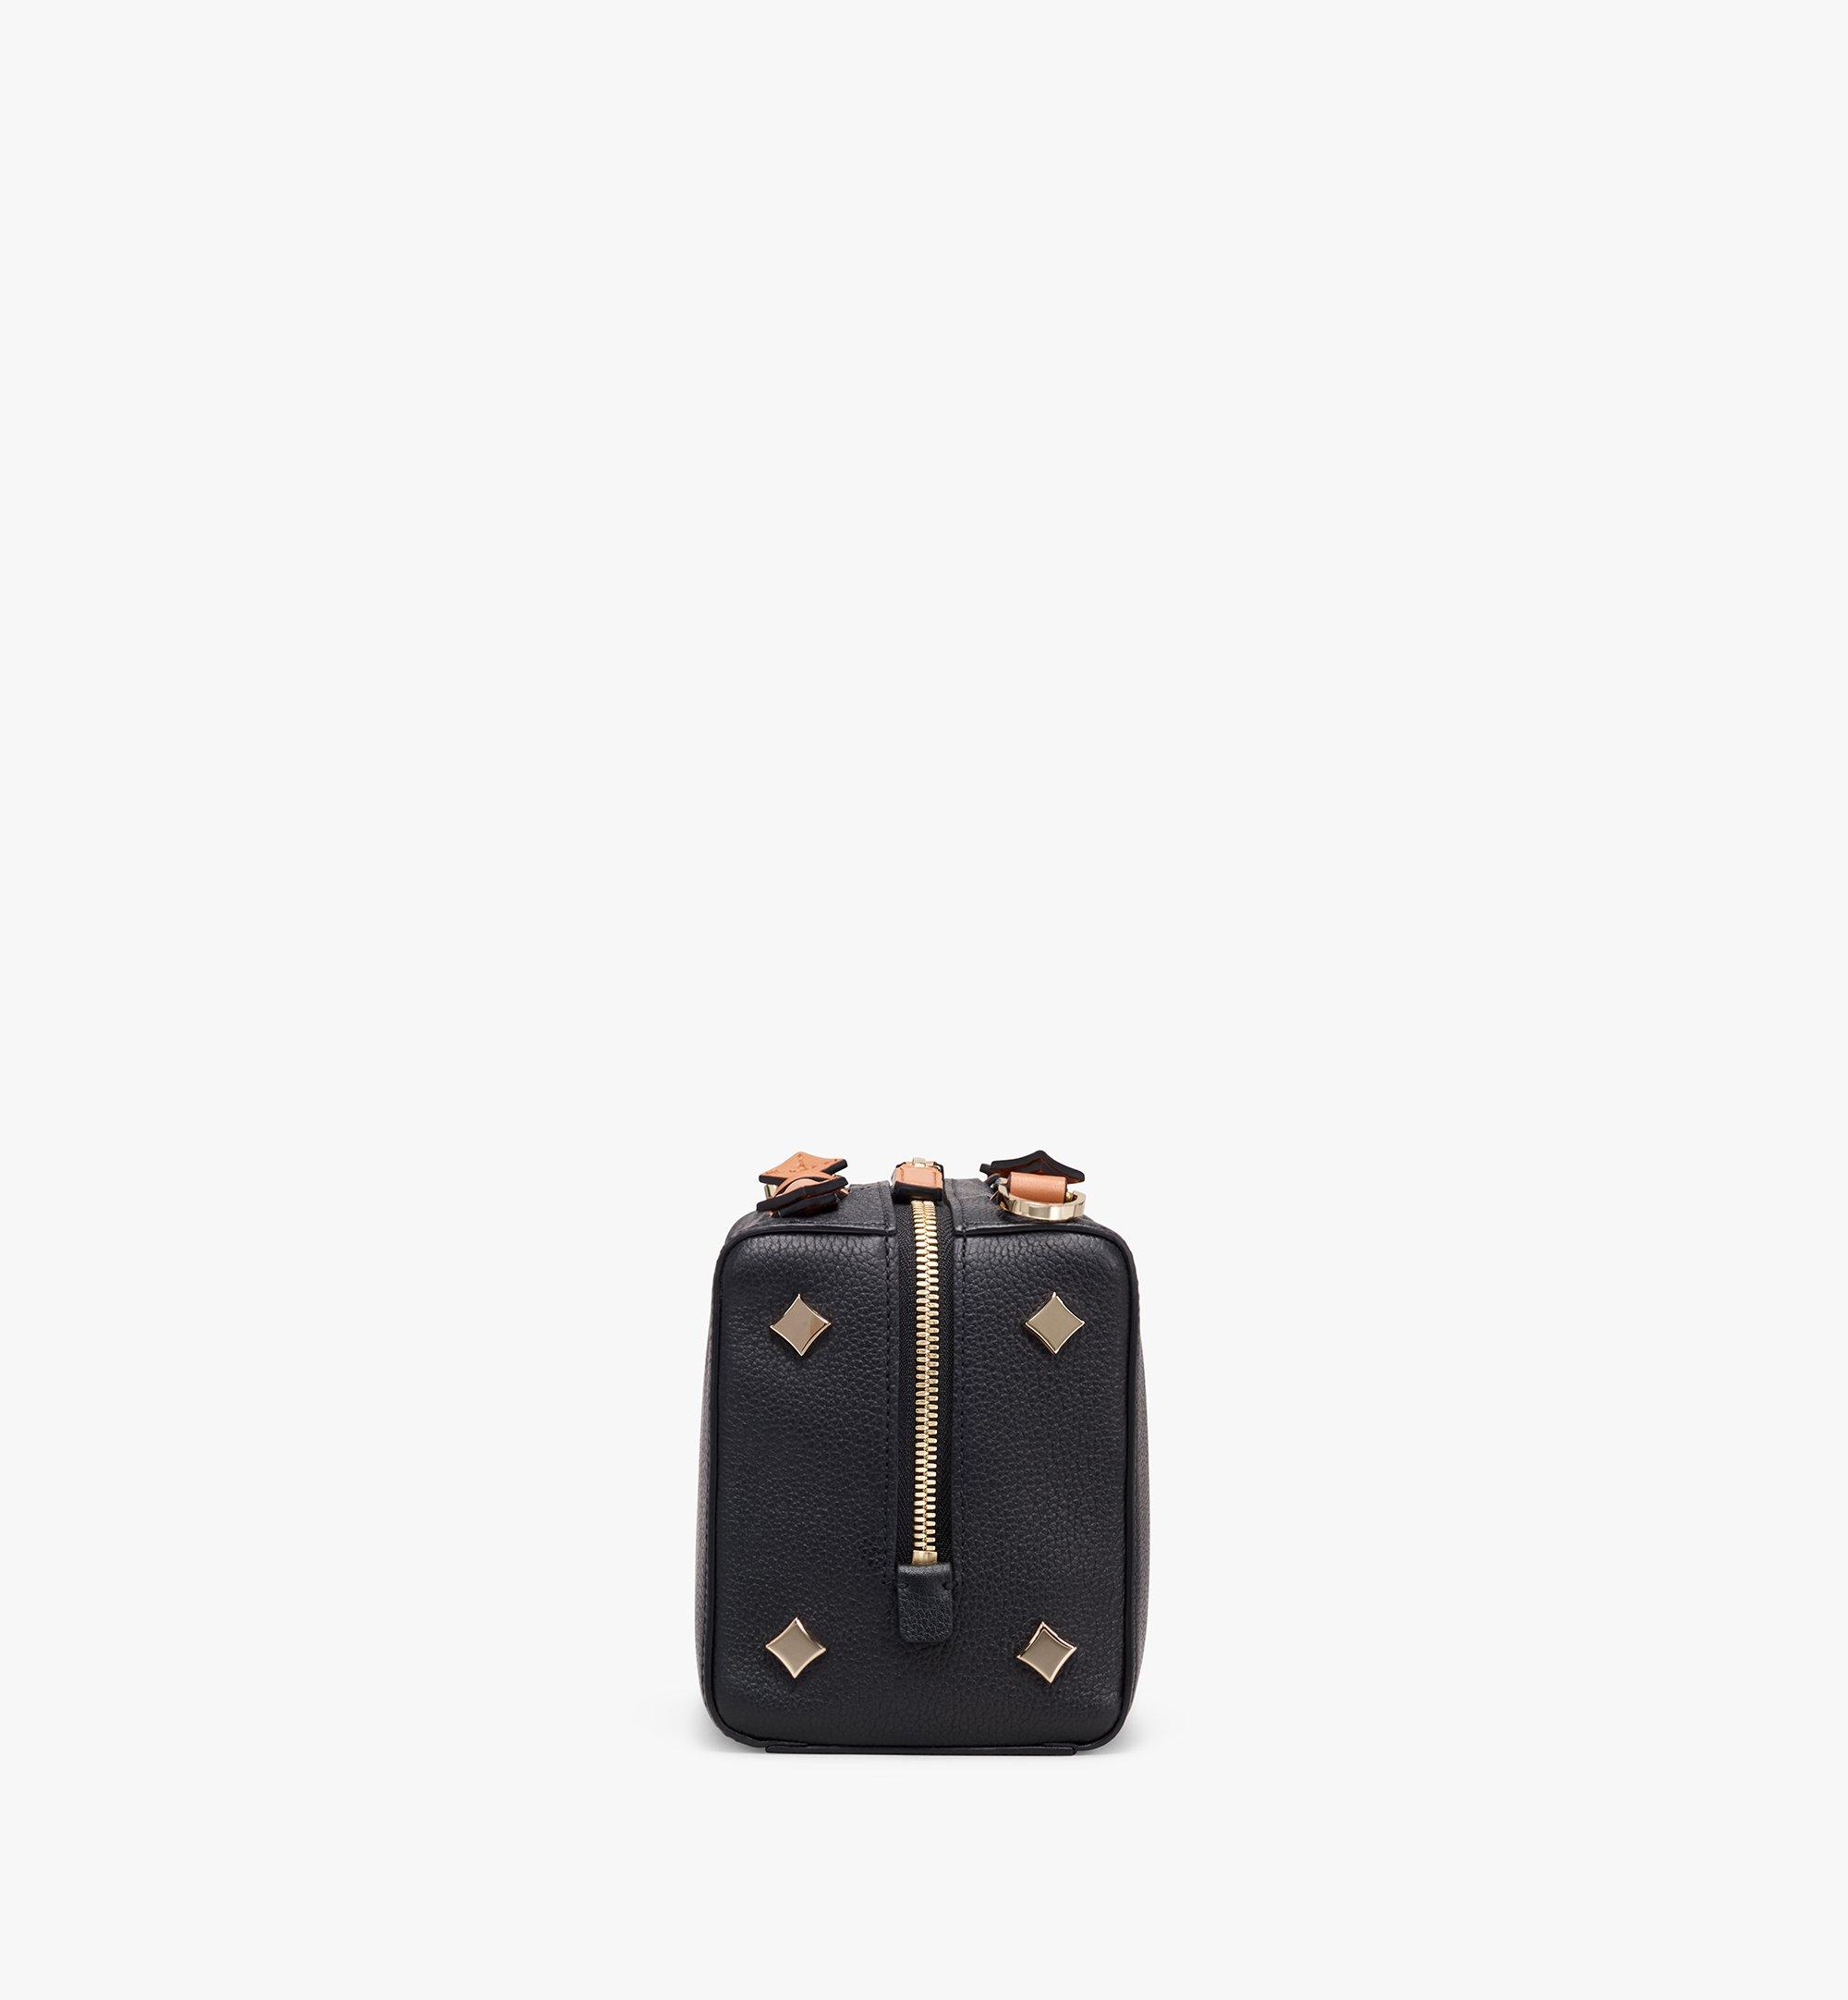 MCM Milano Boston Bag in Calfskin Leather Black MWB9ADA52BK001 Alternate View 2